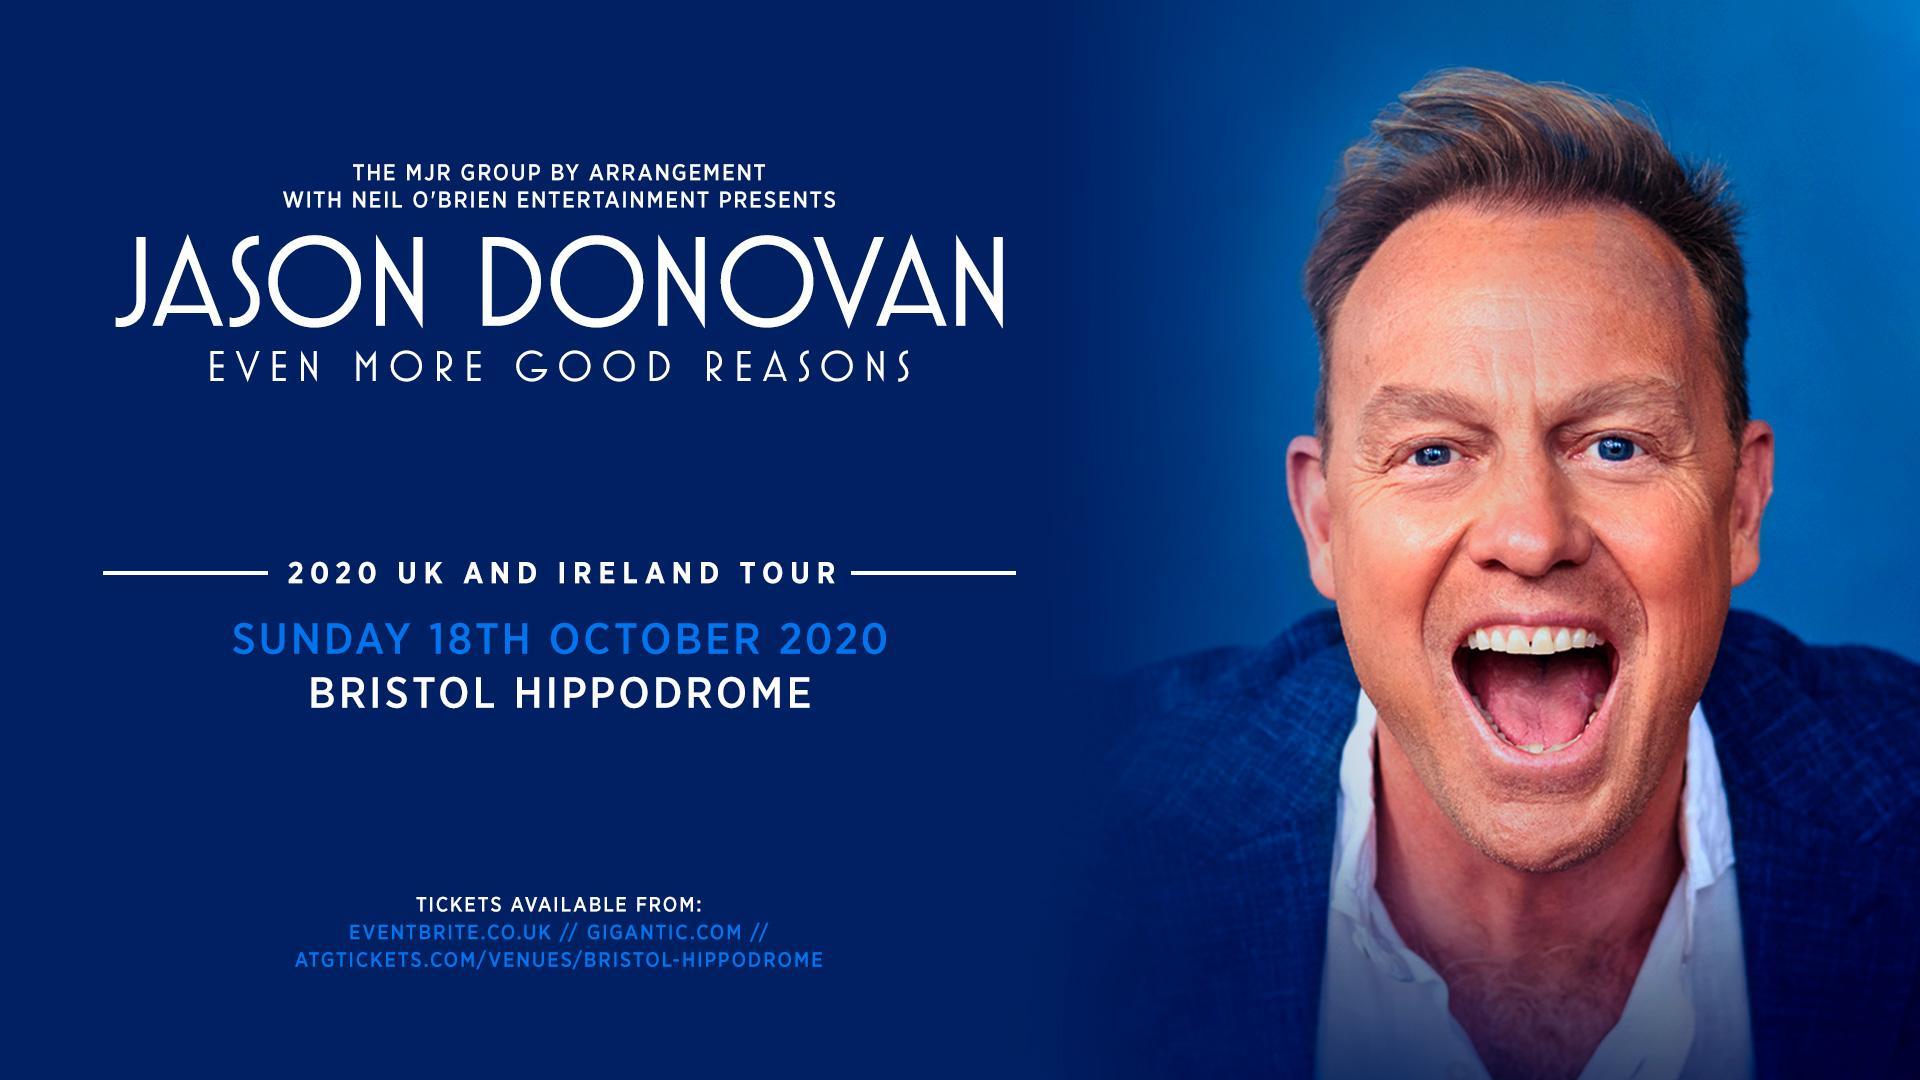 Jason Donovan 'Even More Good Reasons' (Hippodrome, Bristol)